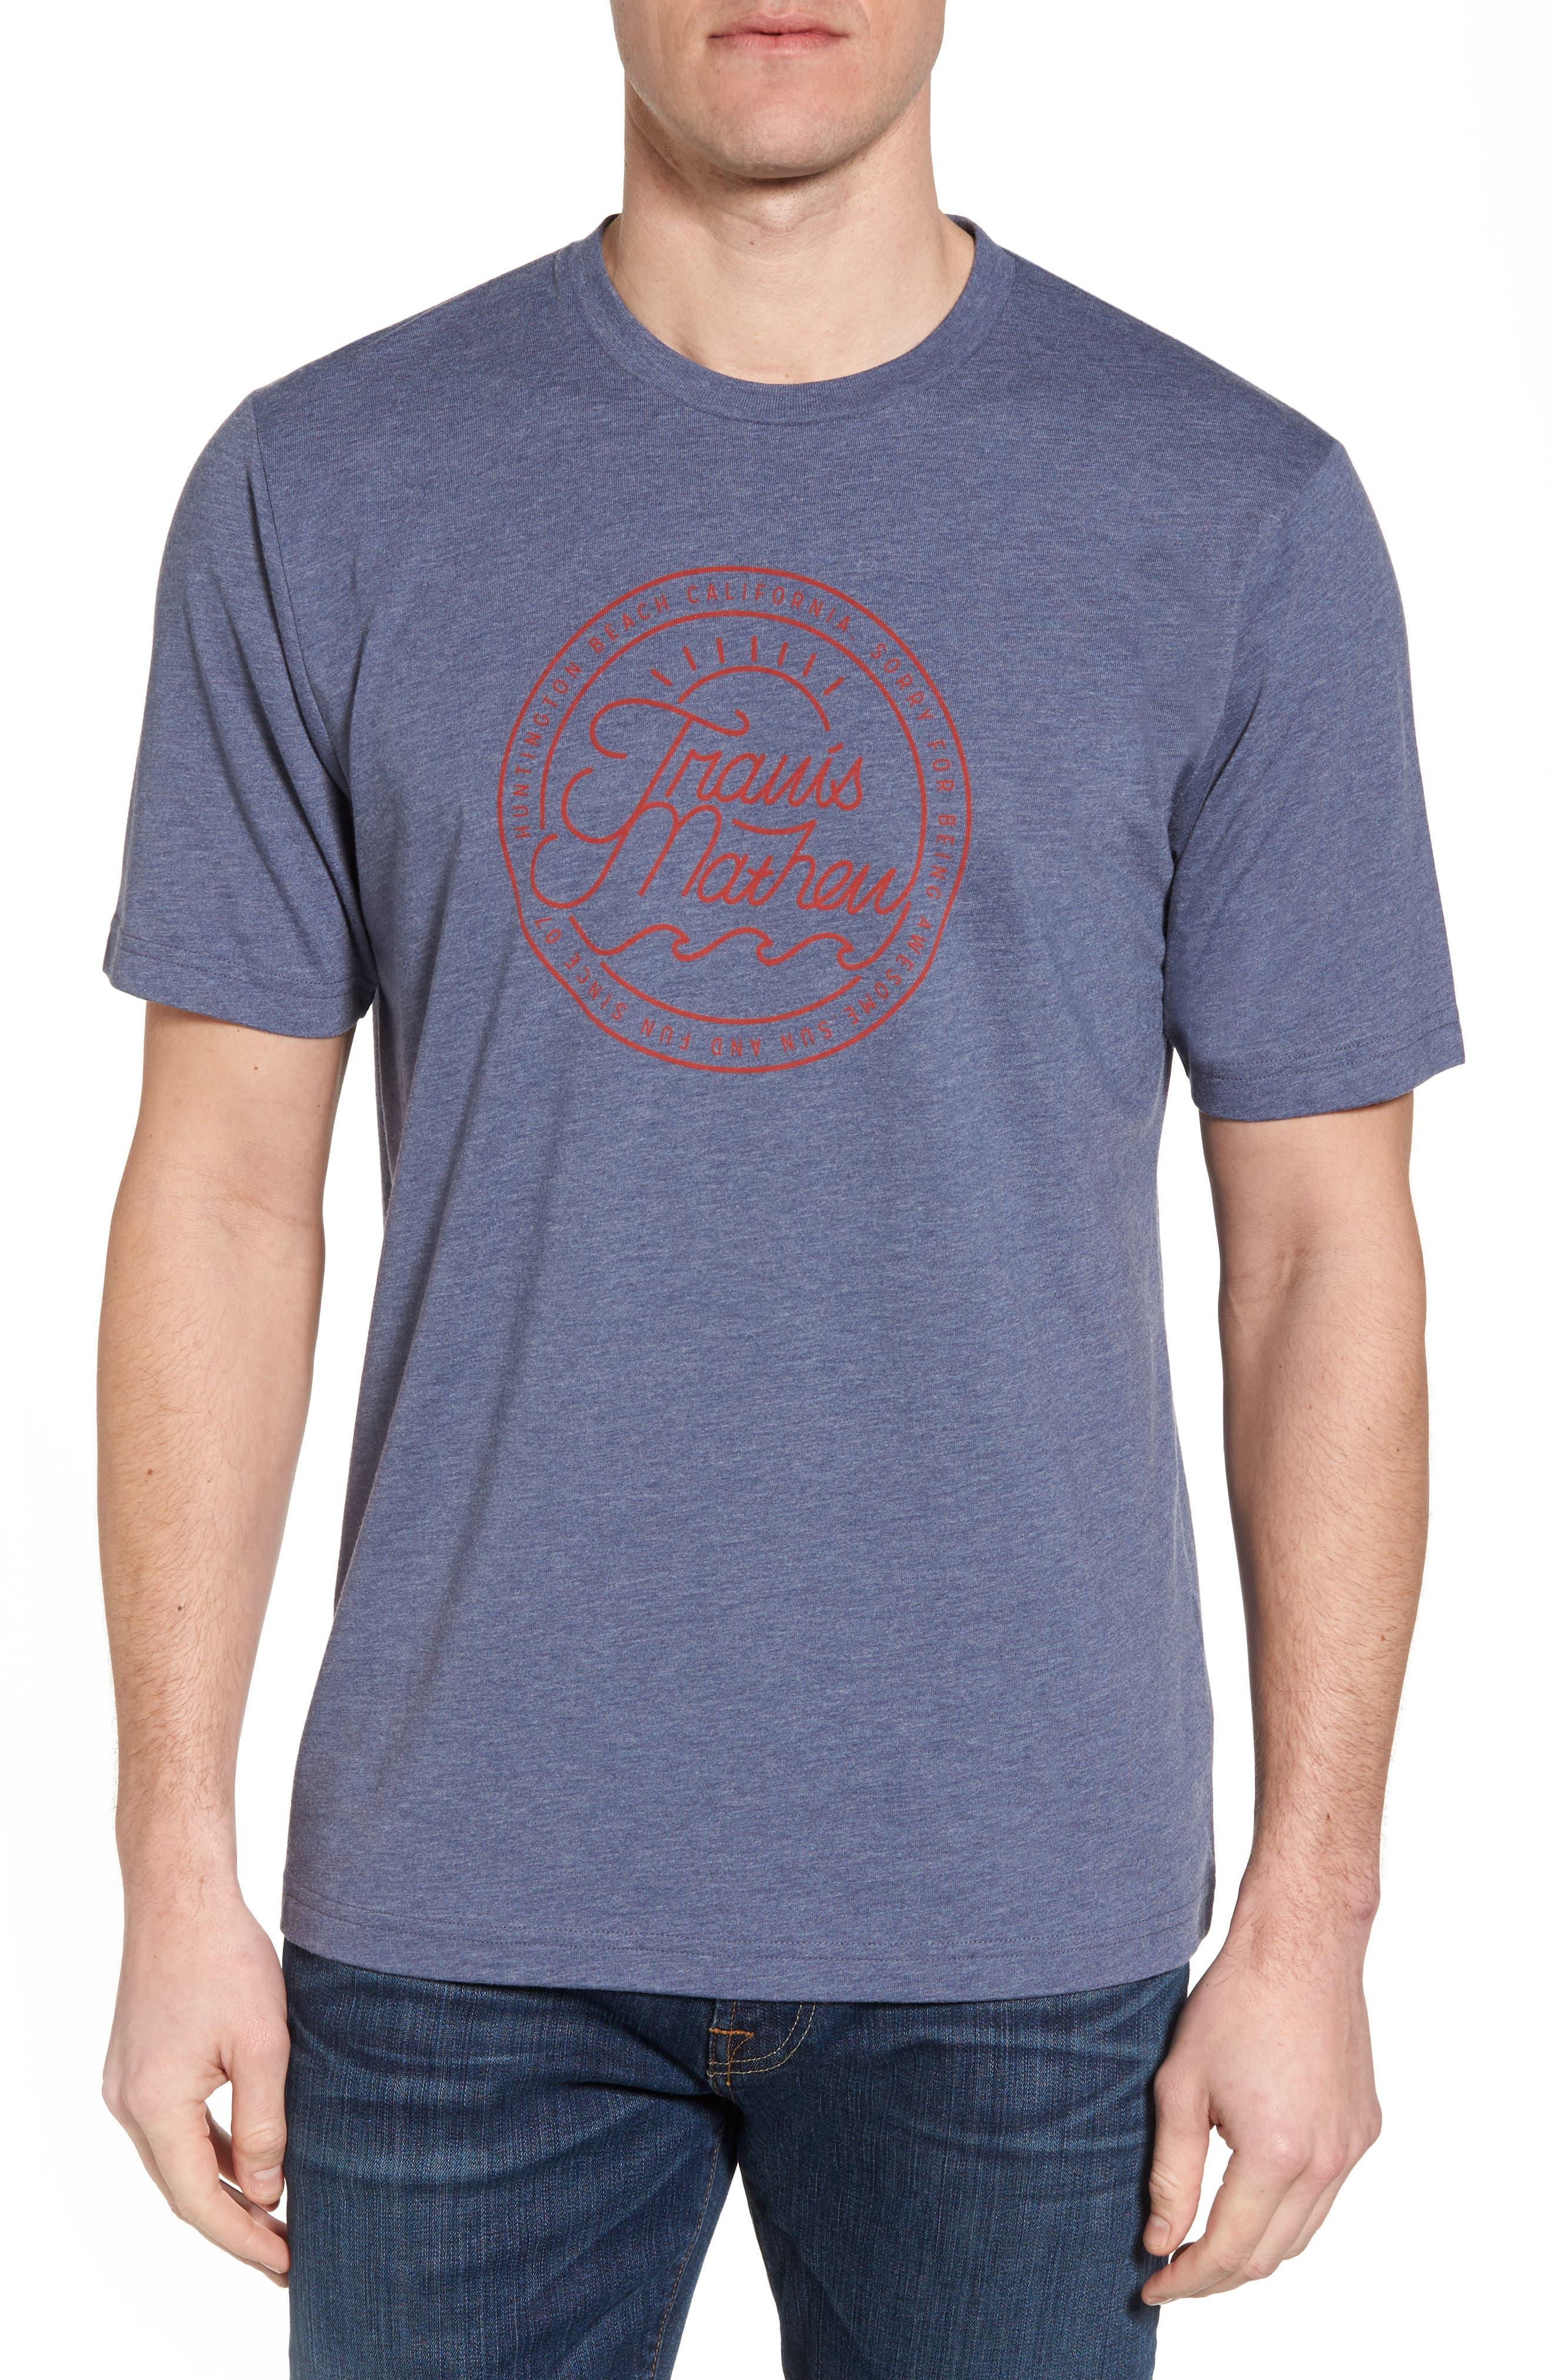 Drebo Graphic T-Shirt,                             Main thumbnail 1, color,                             Heather Blue Nights